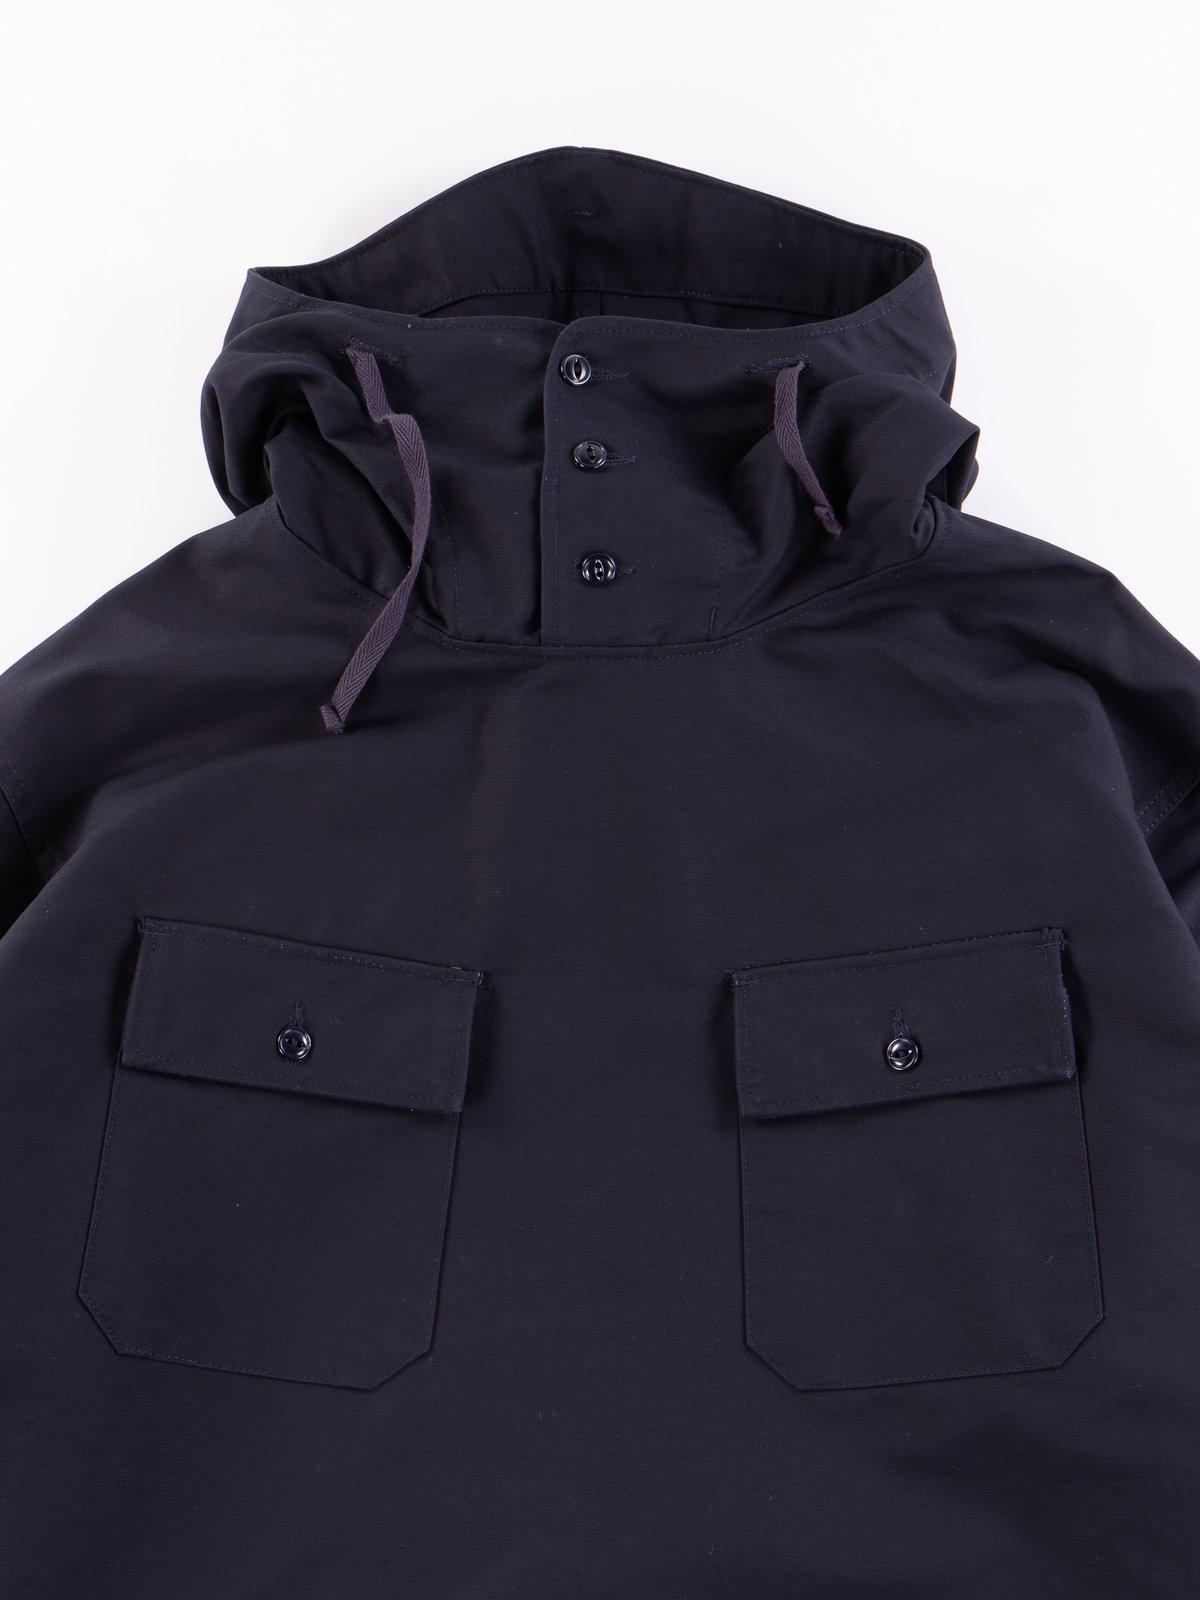 Navy Cotton Double Cloth Cagoule Shirt - Image 3